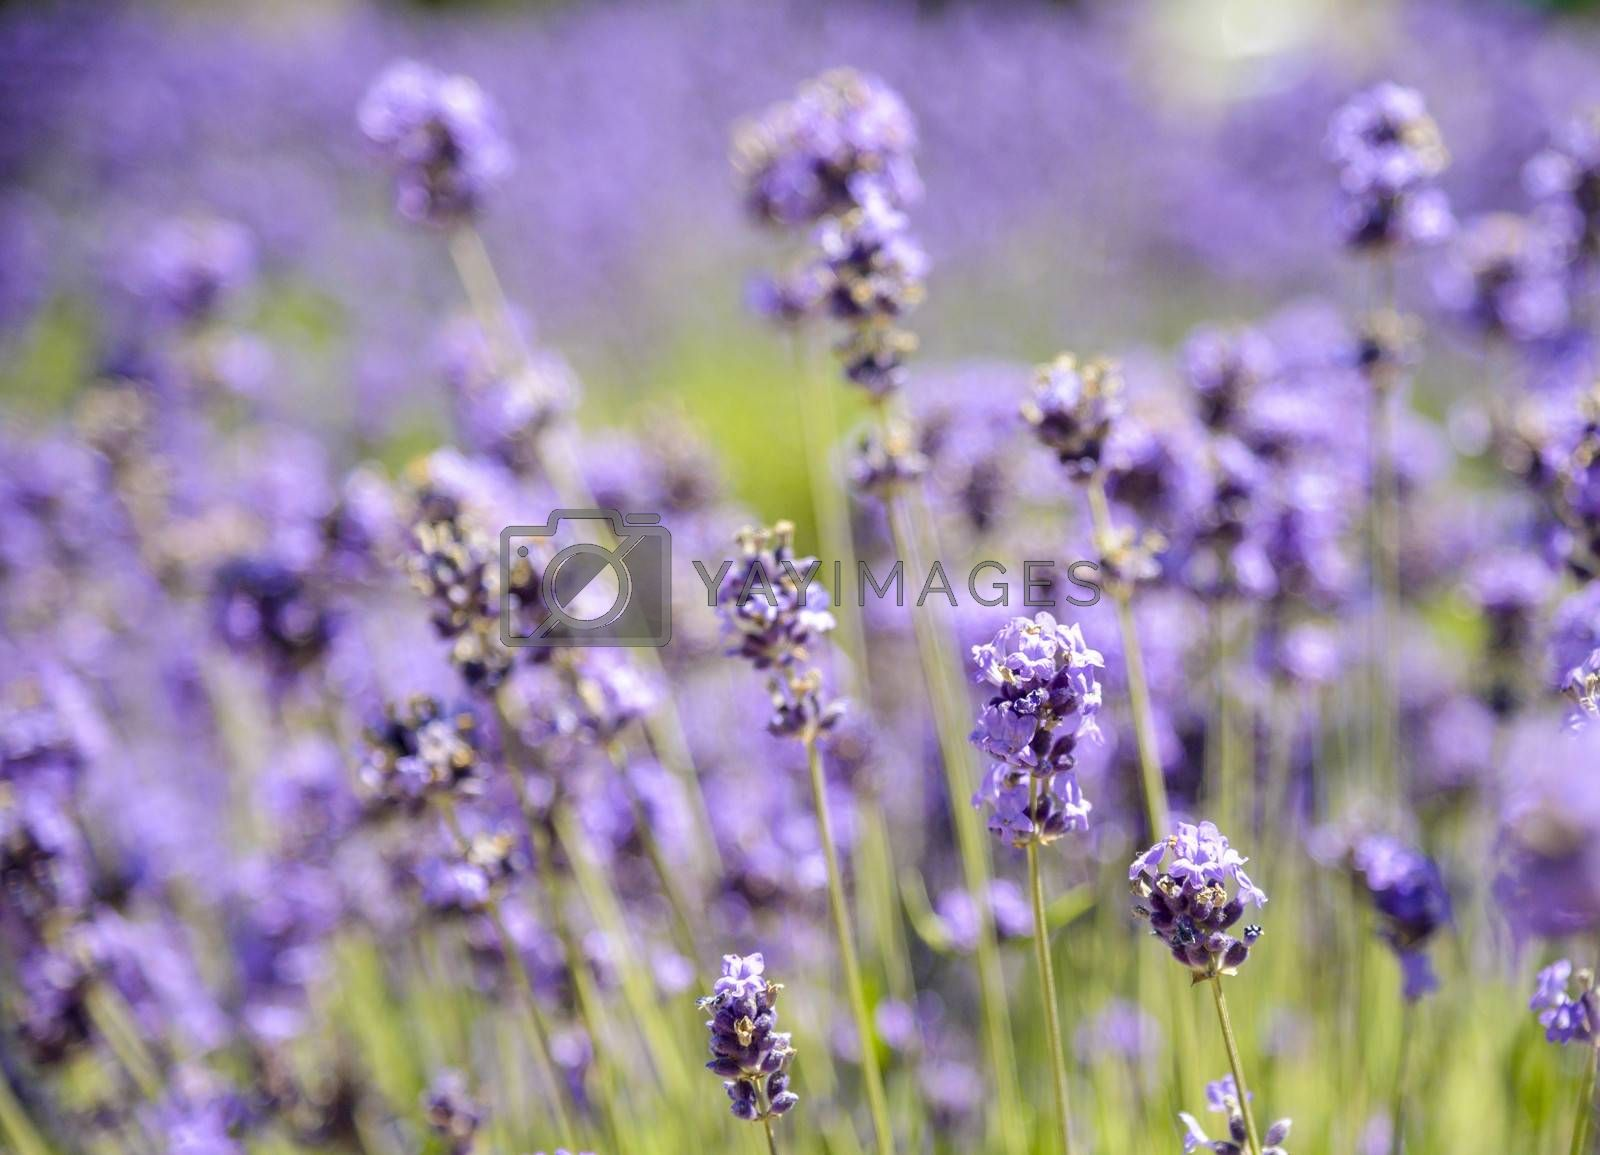 Plenty Lavender in the field3